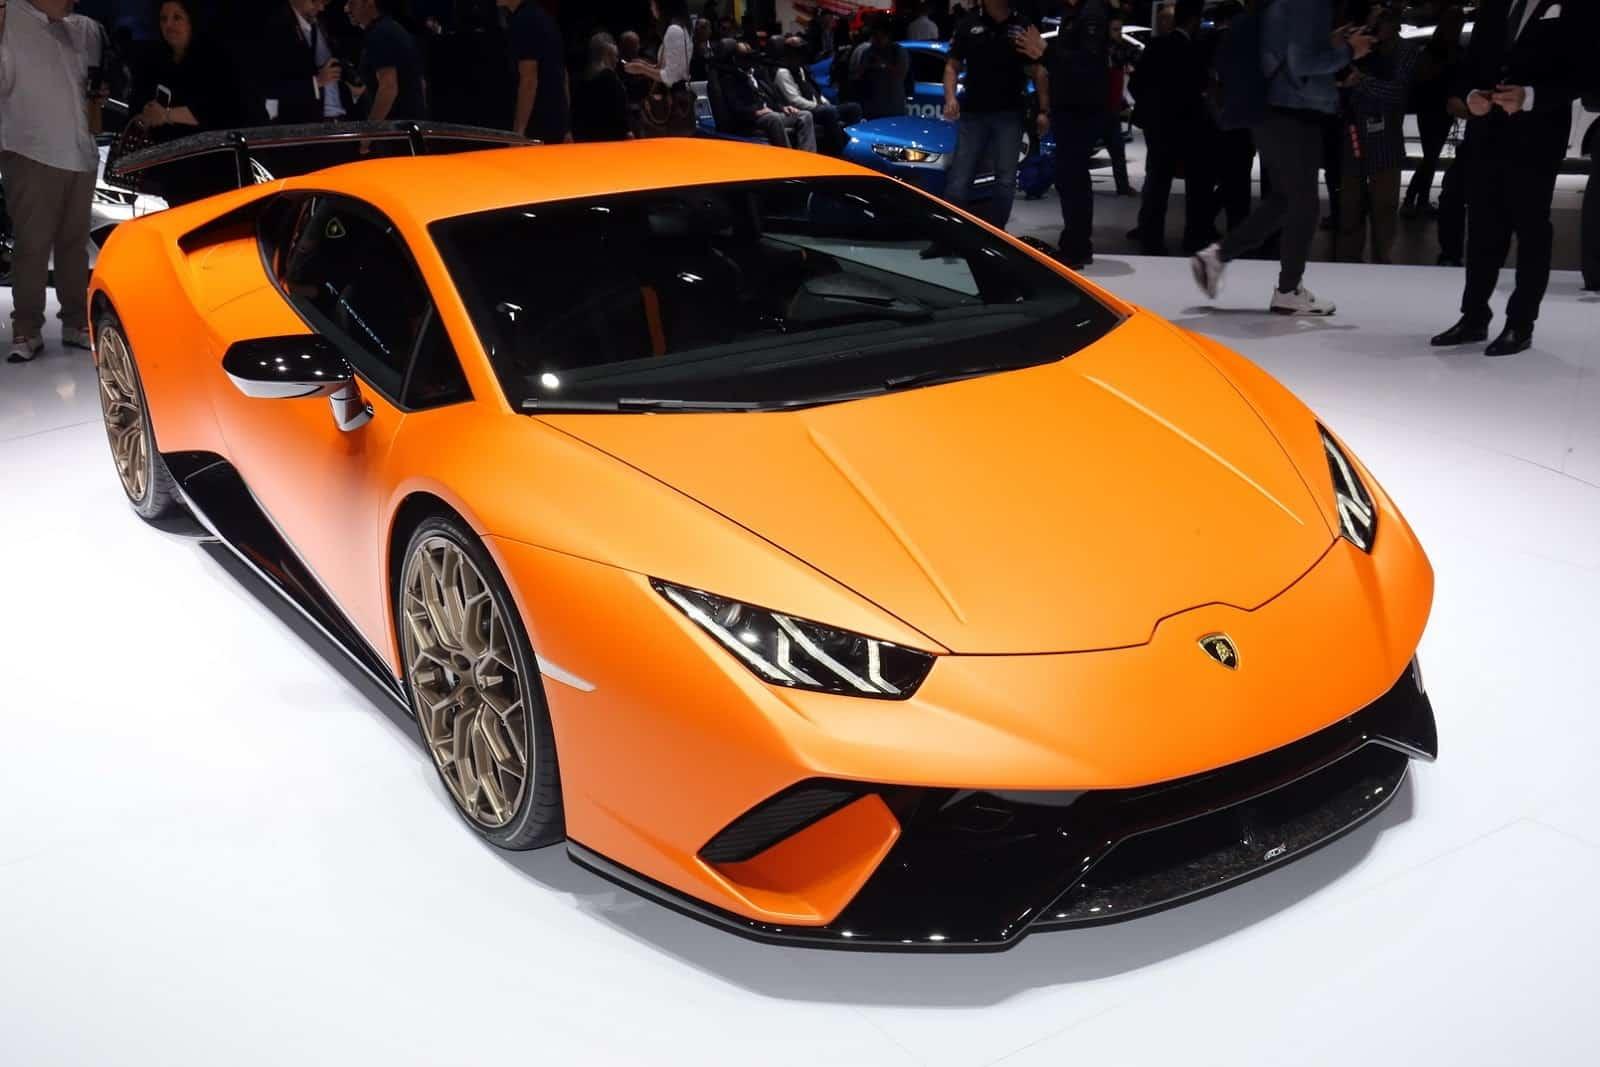 Lamborghini Most Expensive Car Price